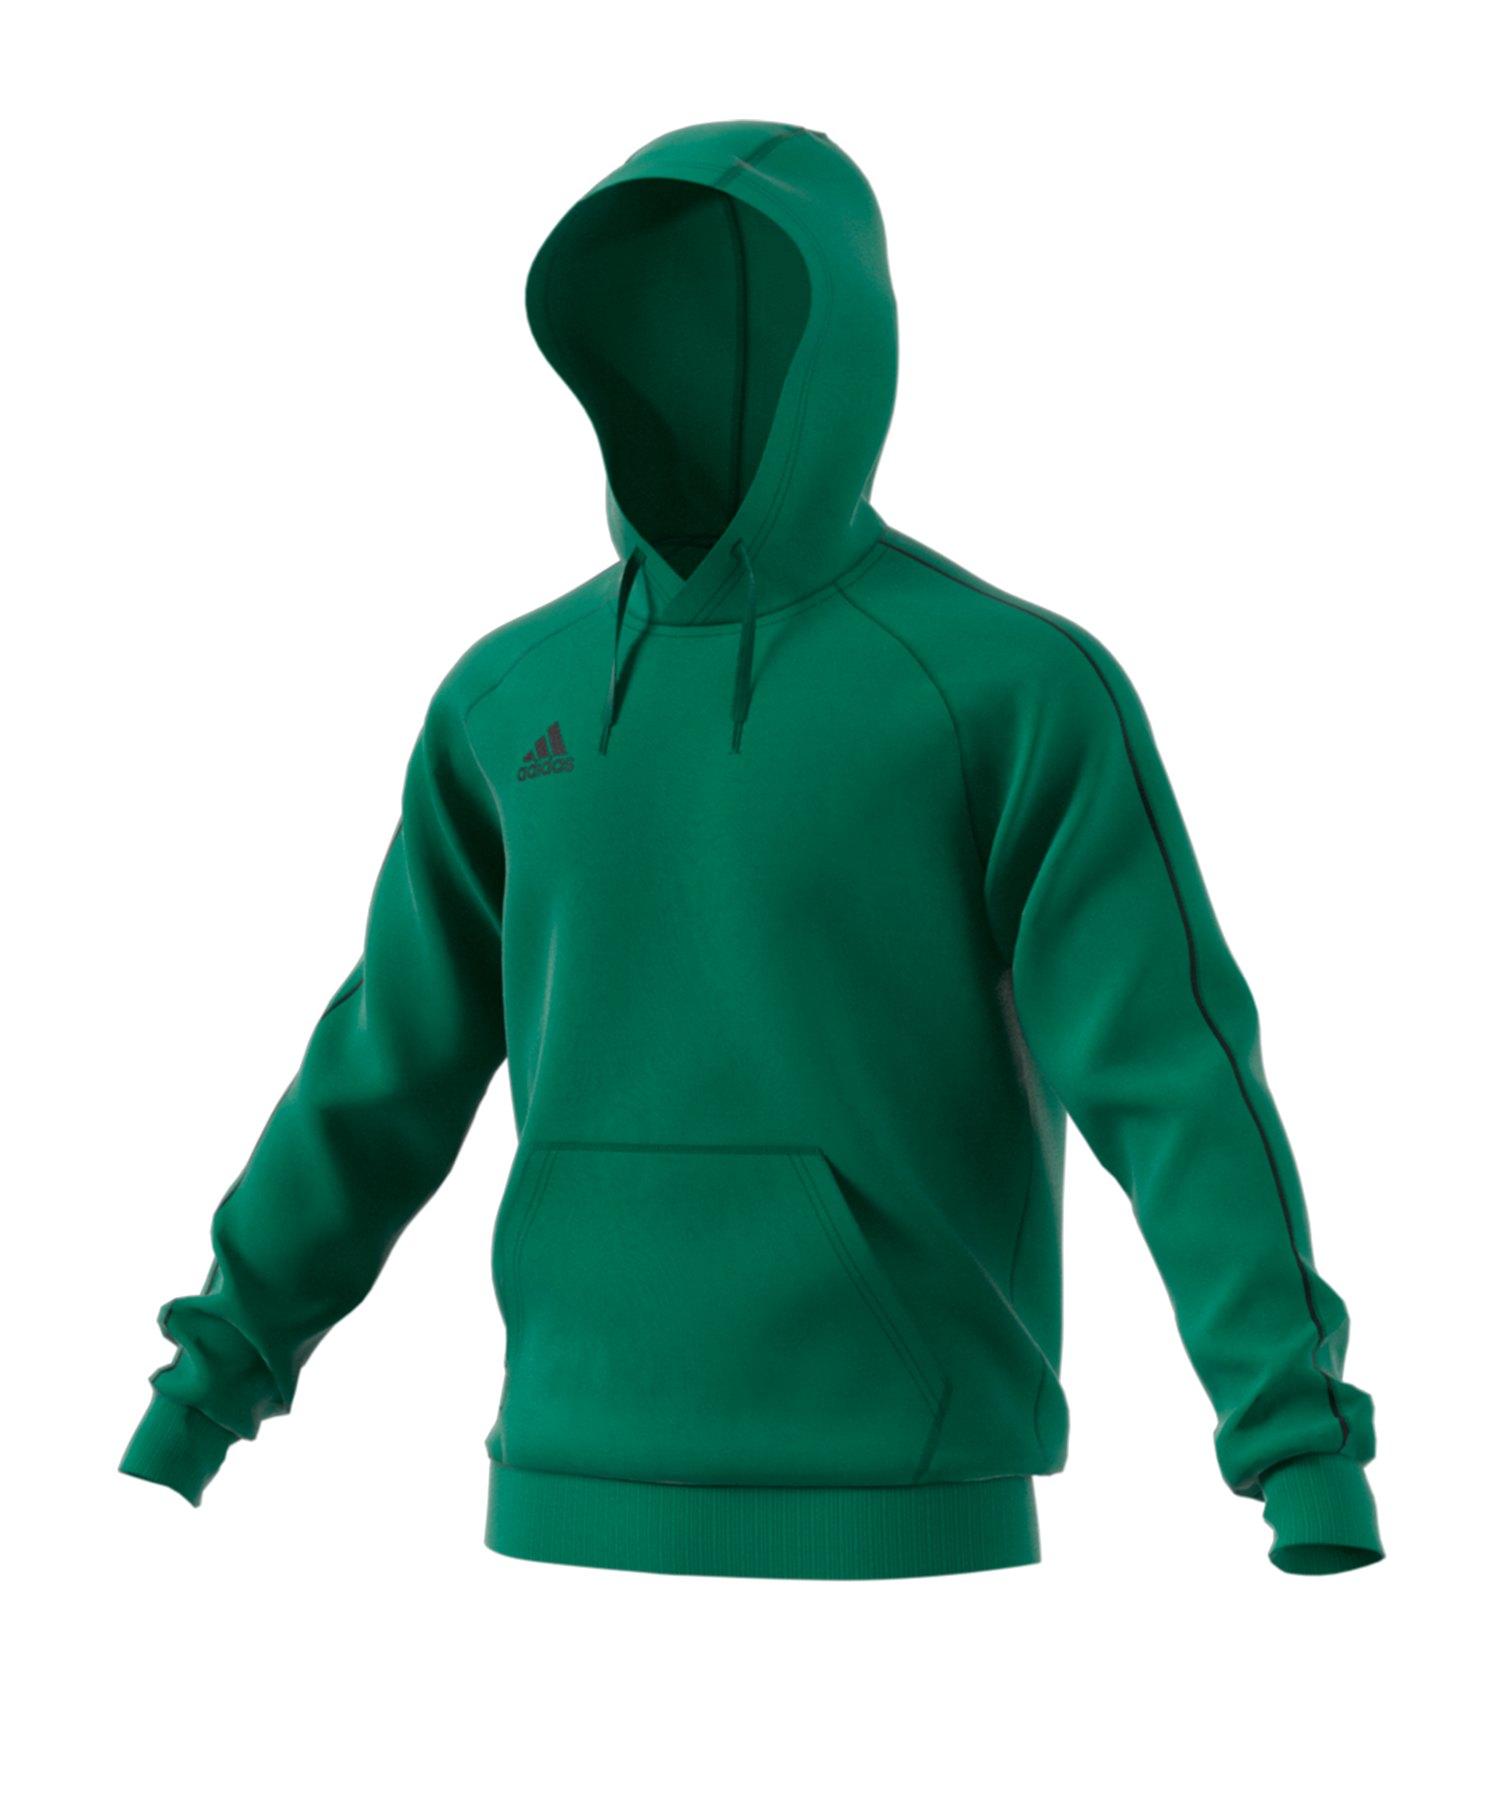 adidas Core 18 Hoody Kapuzenswearshirt Grün - gruen